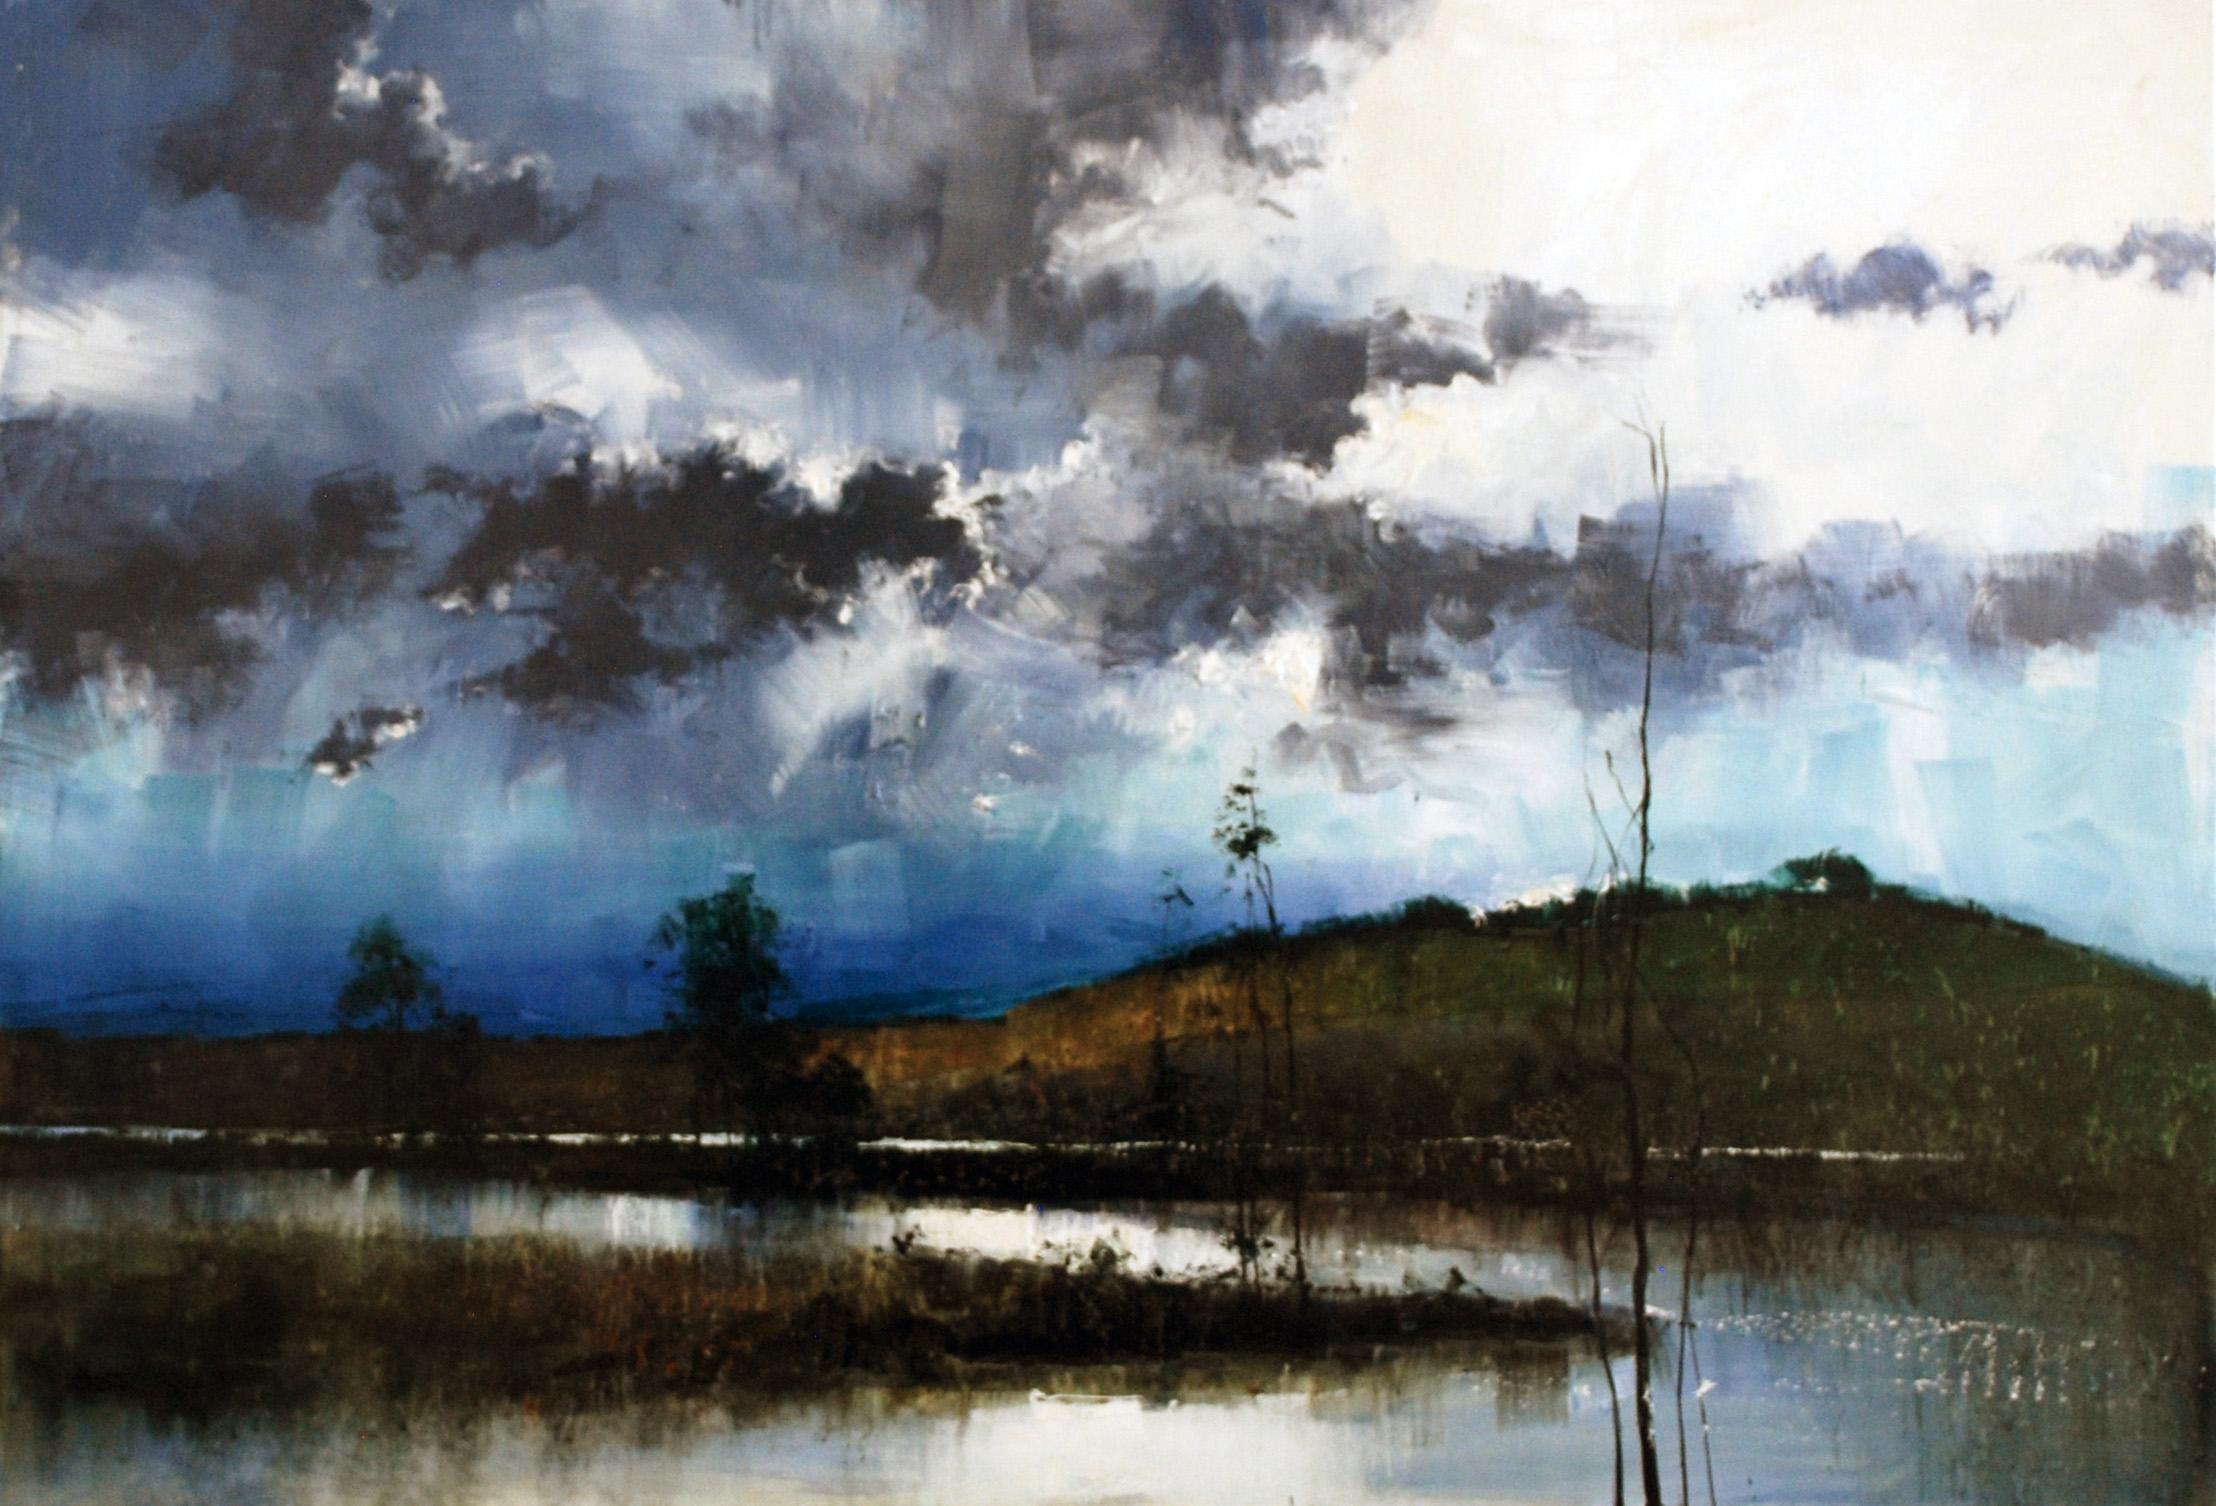 Herman Pekel, Yarra (untitled) 2018 oil on canvas, 153 x 107 cm, available